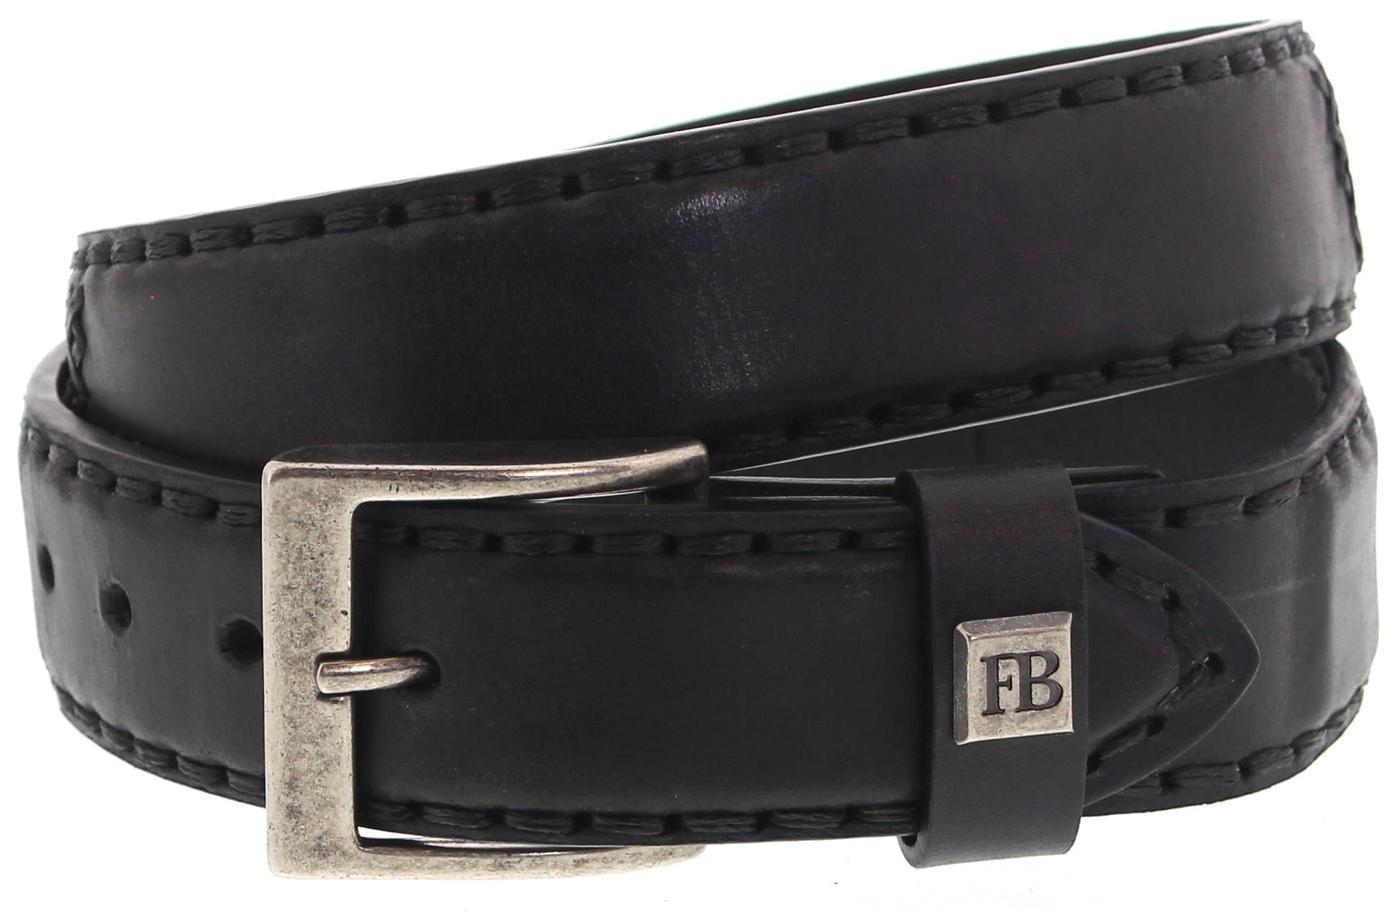 Fashion Boots FG3005 Codet Negro leather belt - mat black